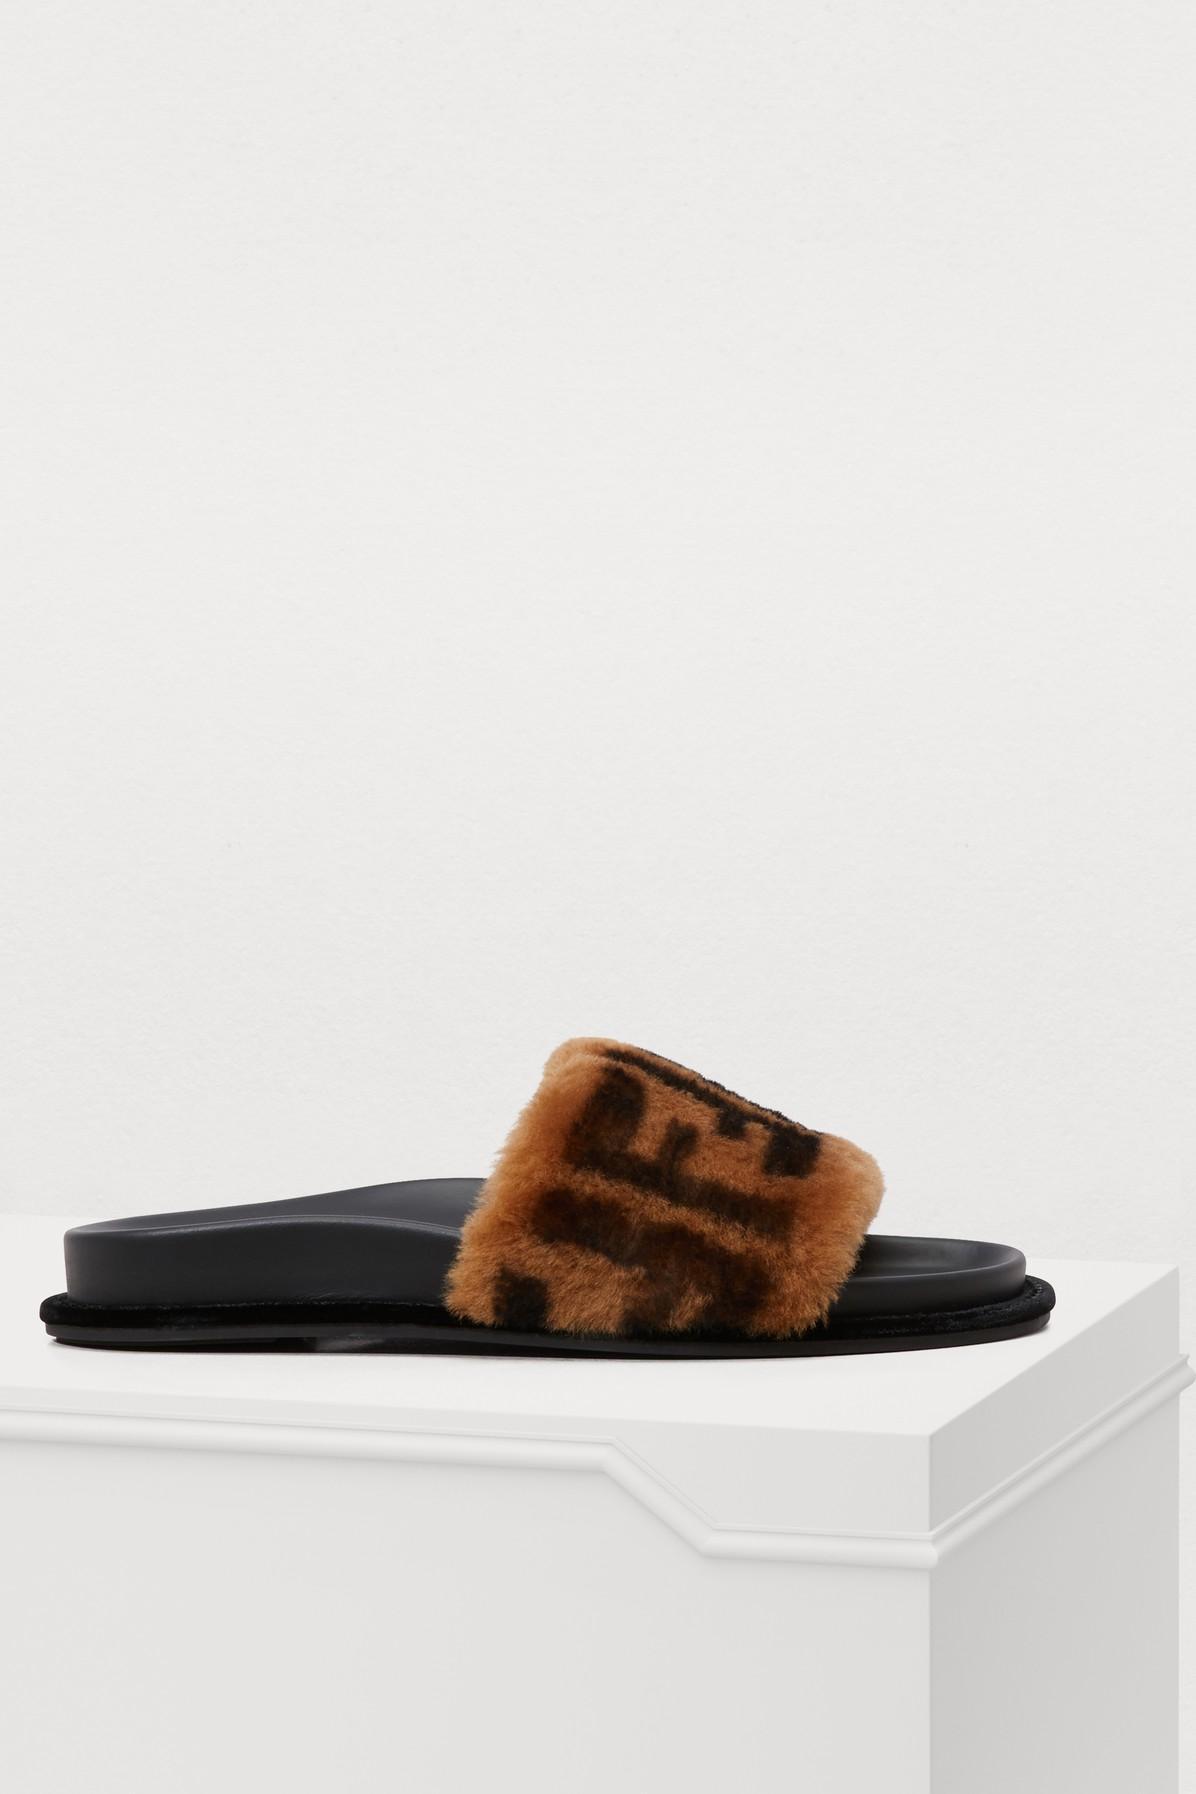 c5de9f4d8bb Fendi 20Mm Logo Shearling Slide Sandals In Brown